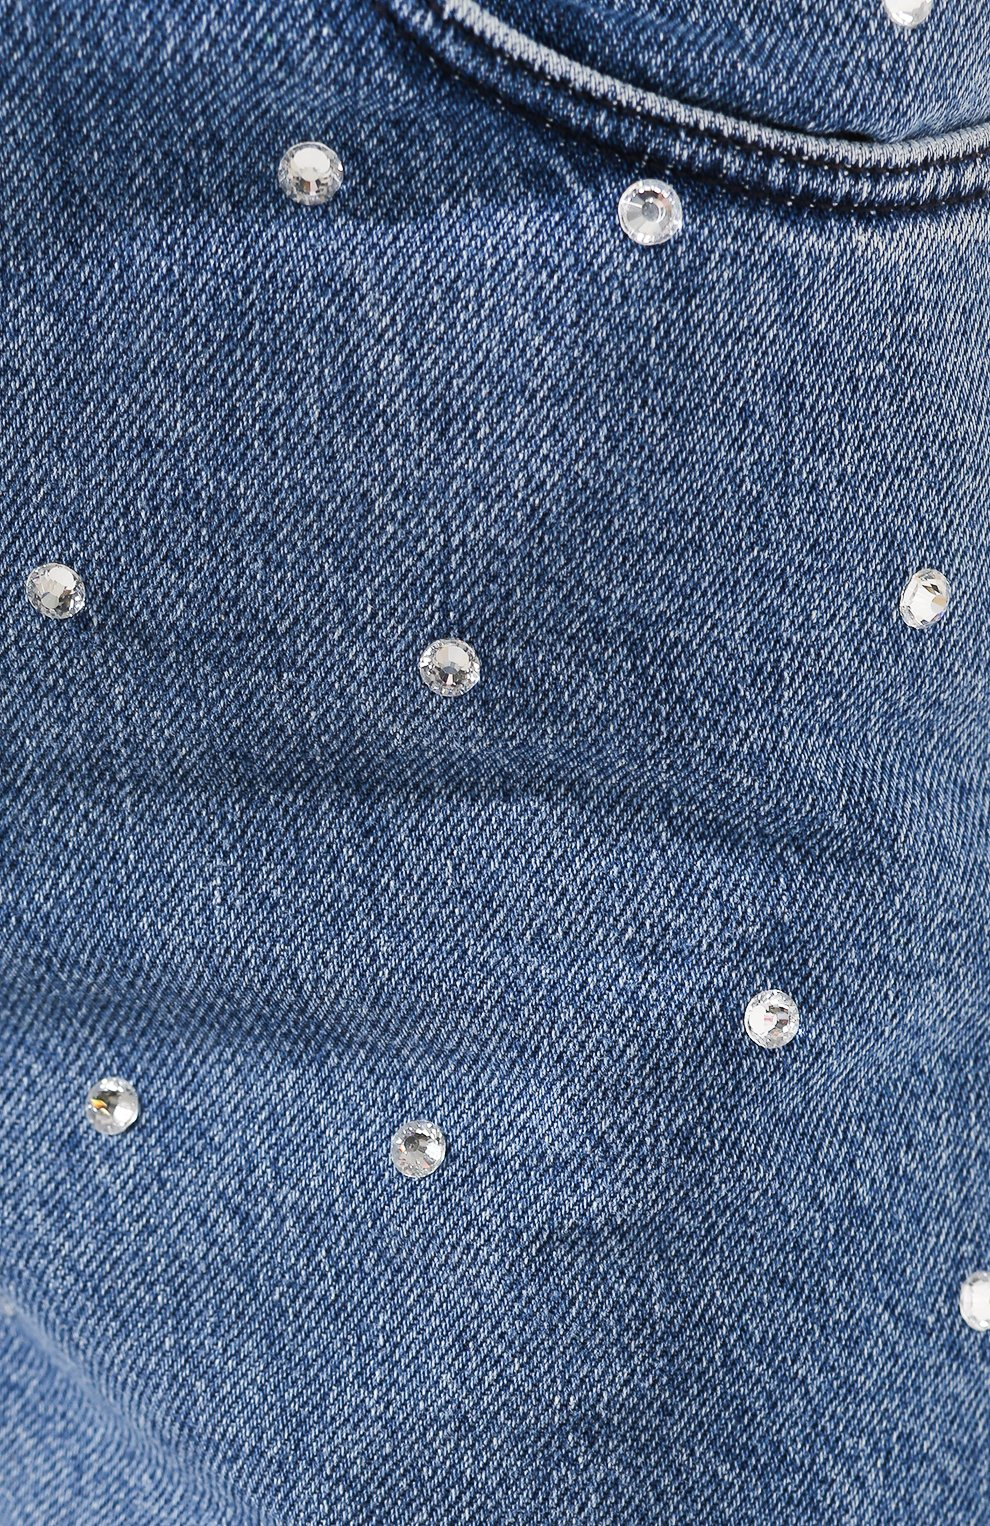 Женские джинсы PHILOSOPHY DI LORENZO SERAFINI голубого цвета, арт. A0332/2130   Фото 5